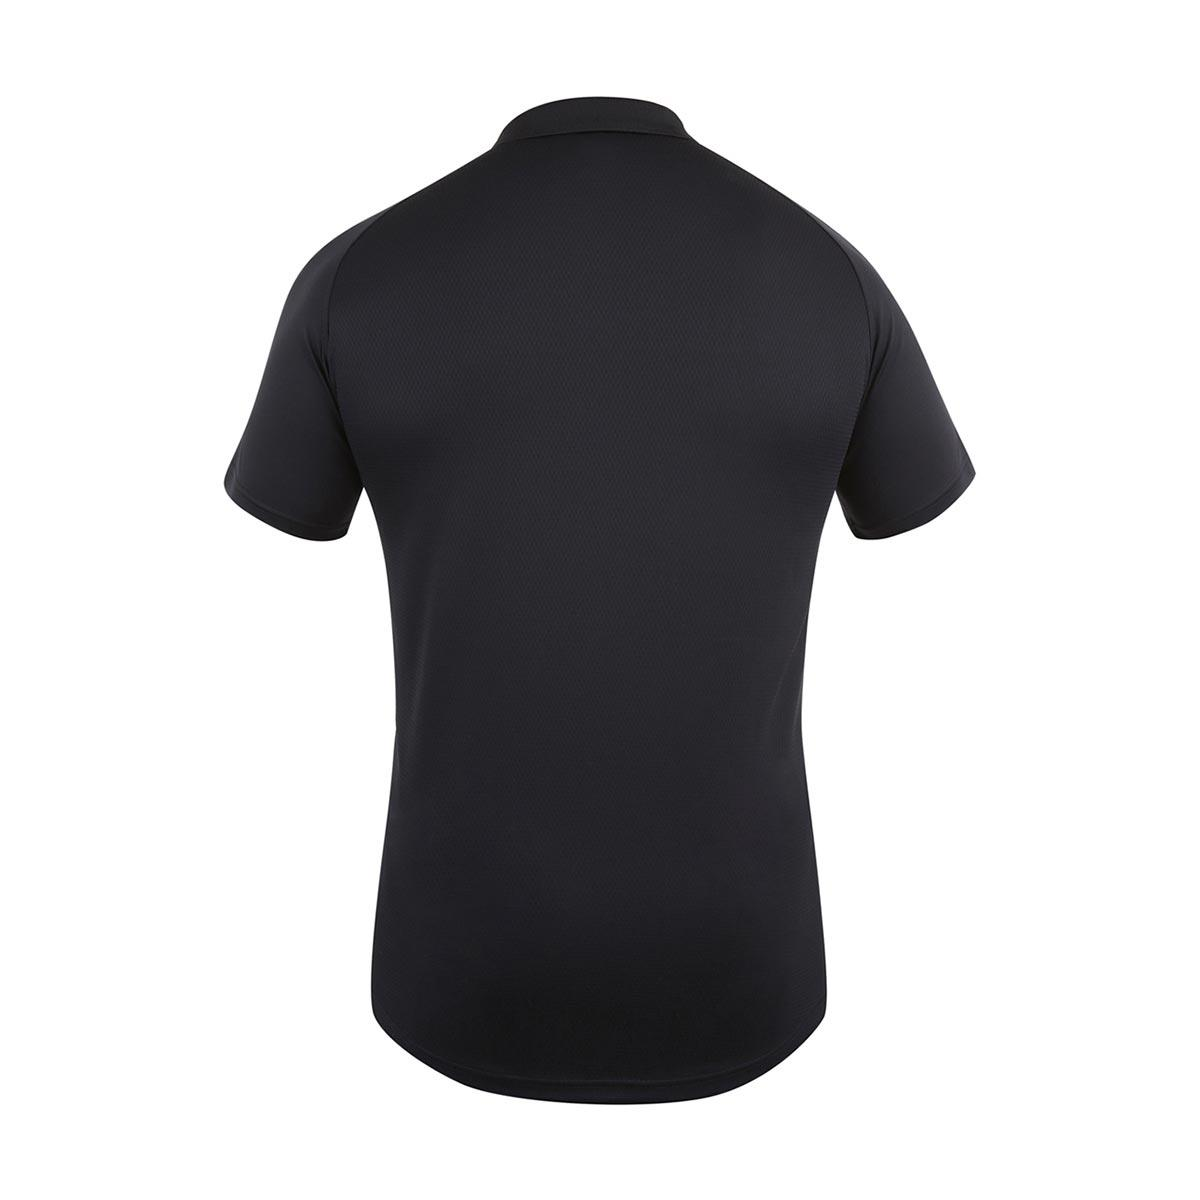 c57ed588cf419d Polo Shirt Black Template « Alzheimer's Network of Oregon